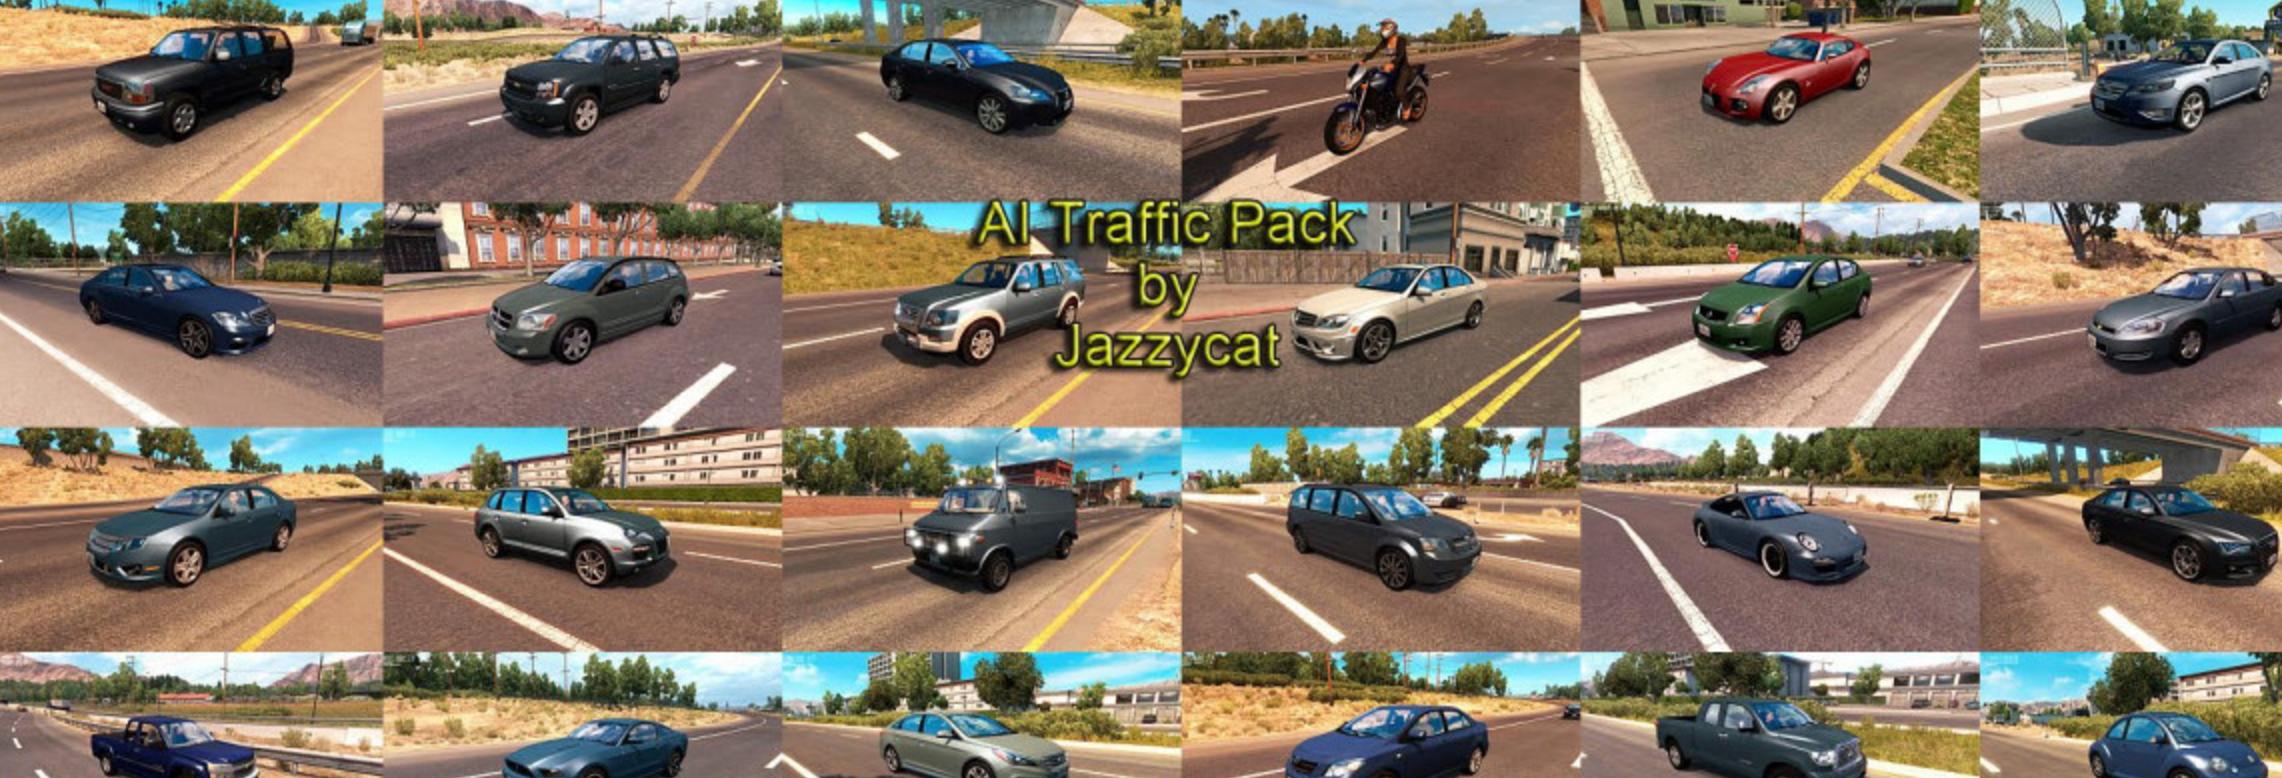 AI Traffic Pack by Jazzycat v1 8 Mod - ATS Mod | American